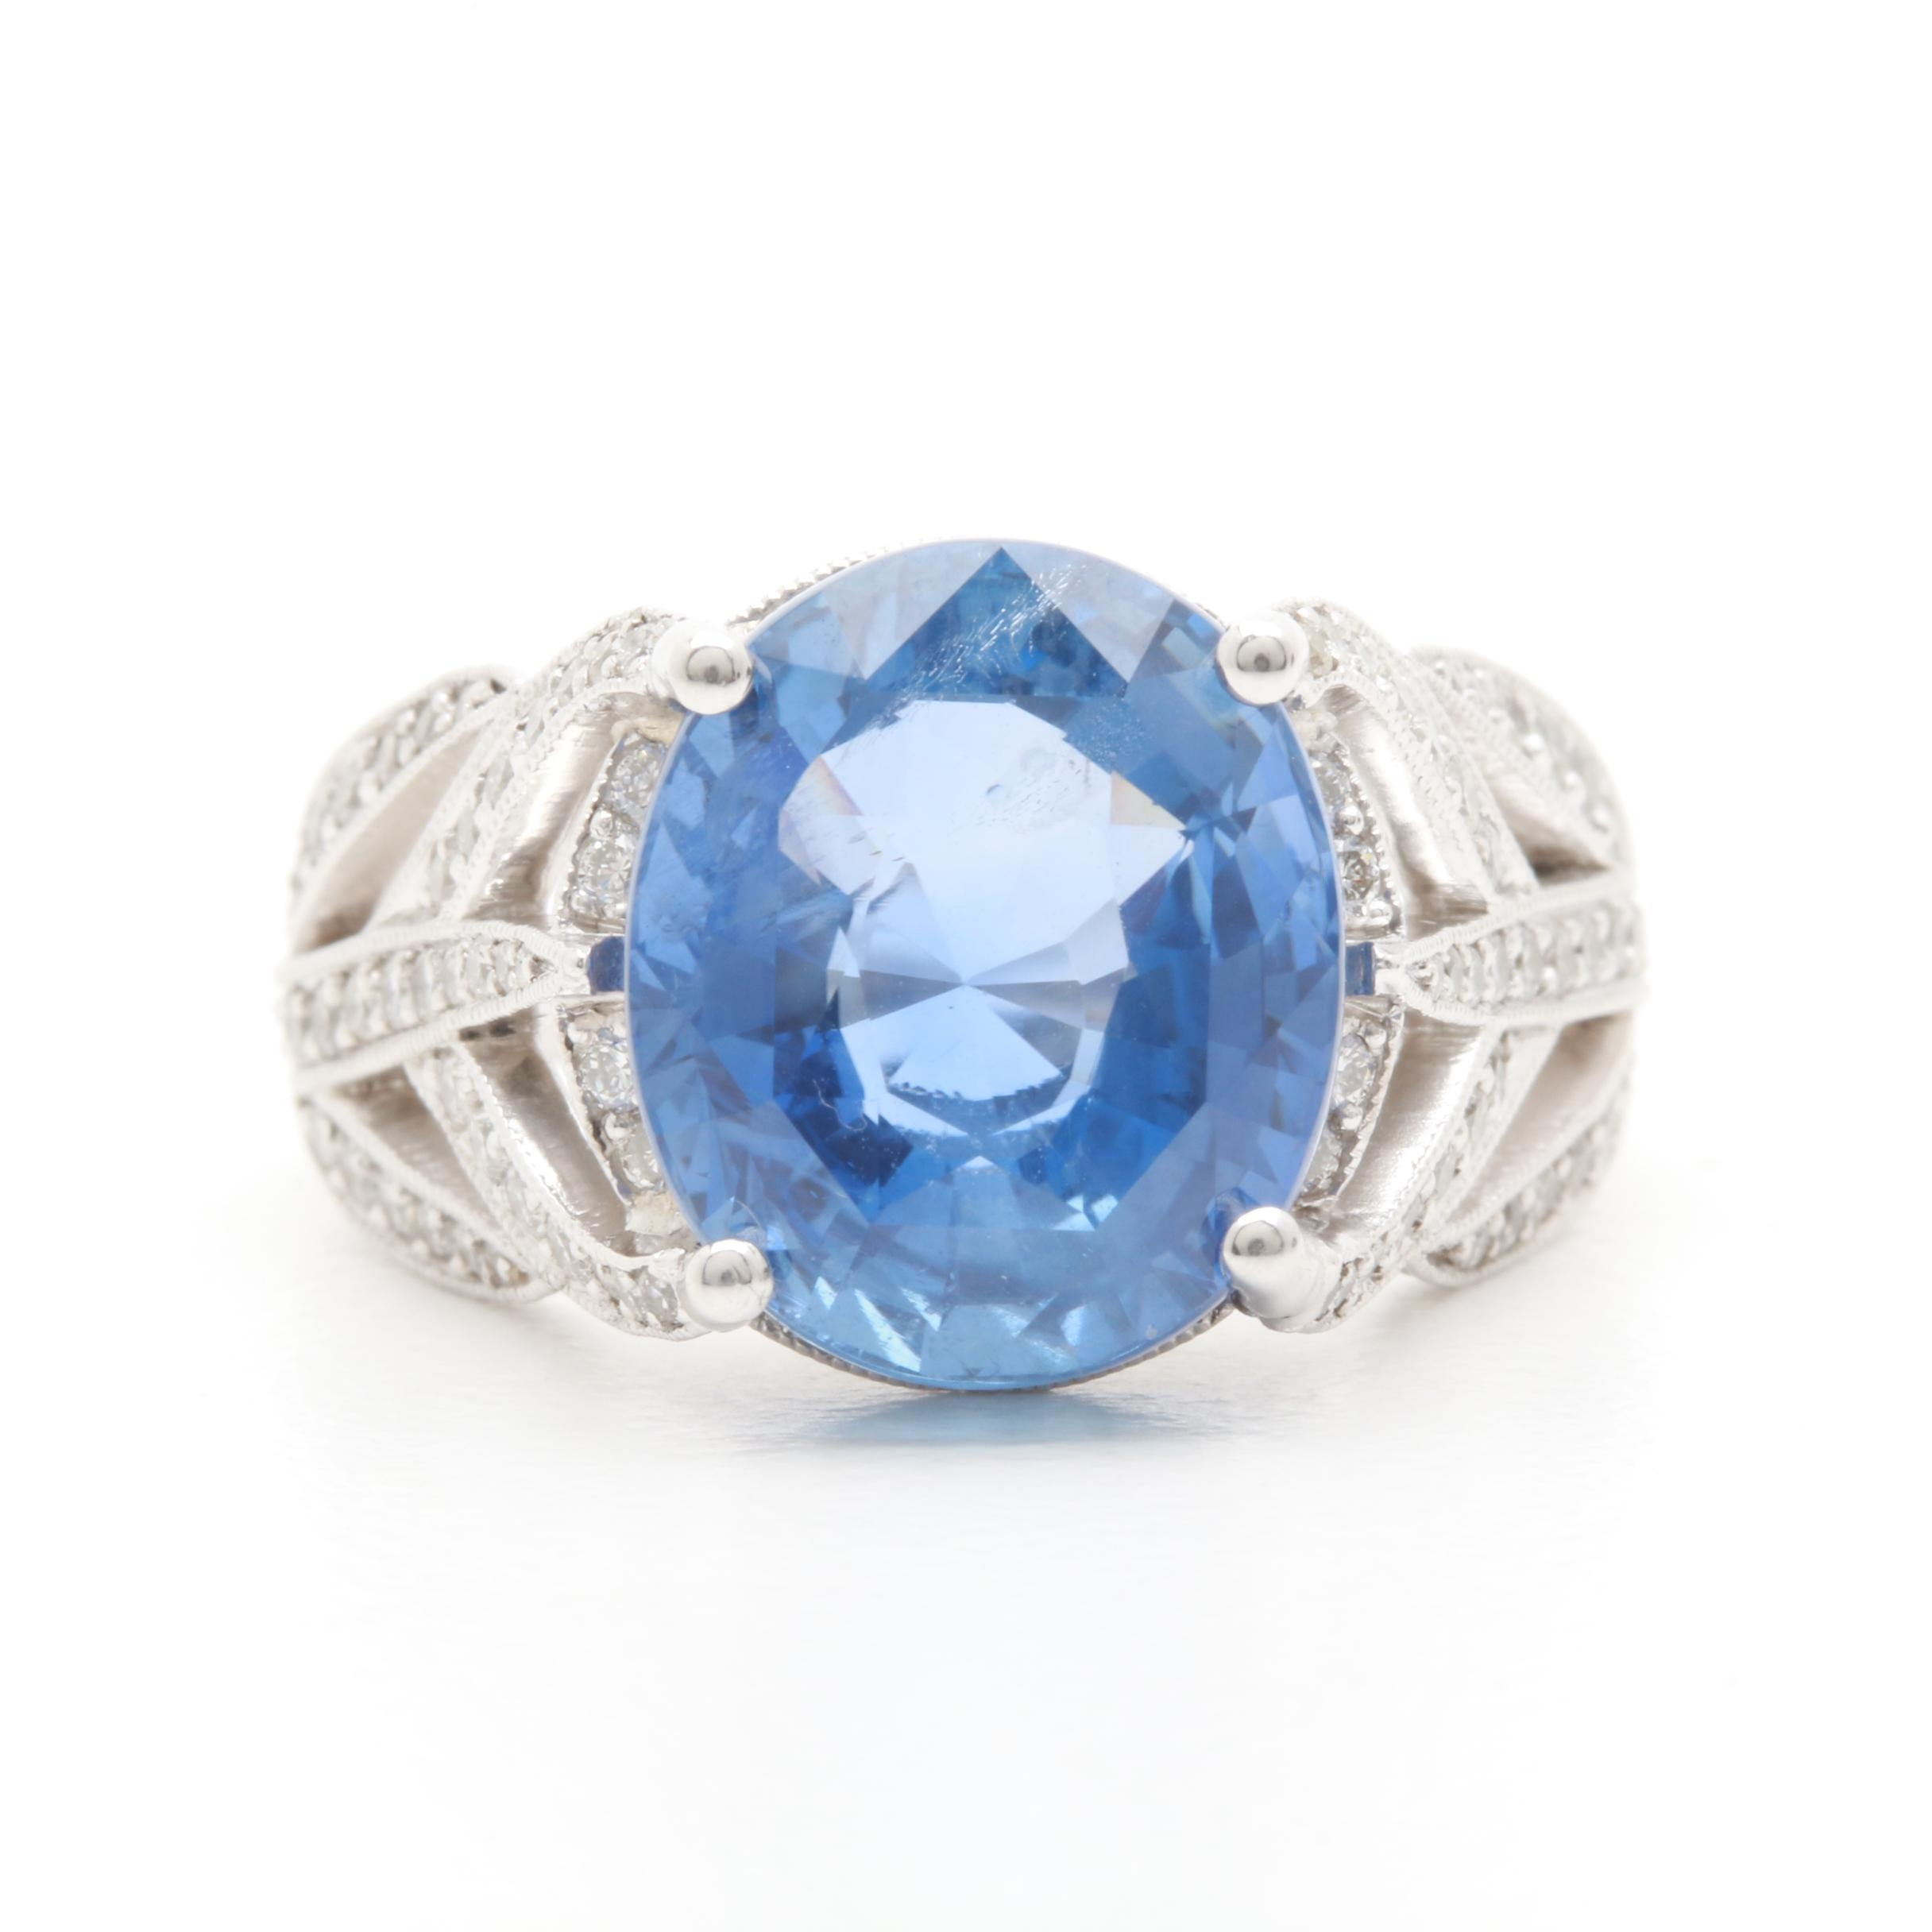 Platinum 7.40 CT Unheated Ceylon Sapphire and 1.24 CTW Diamond Ring With Report